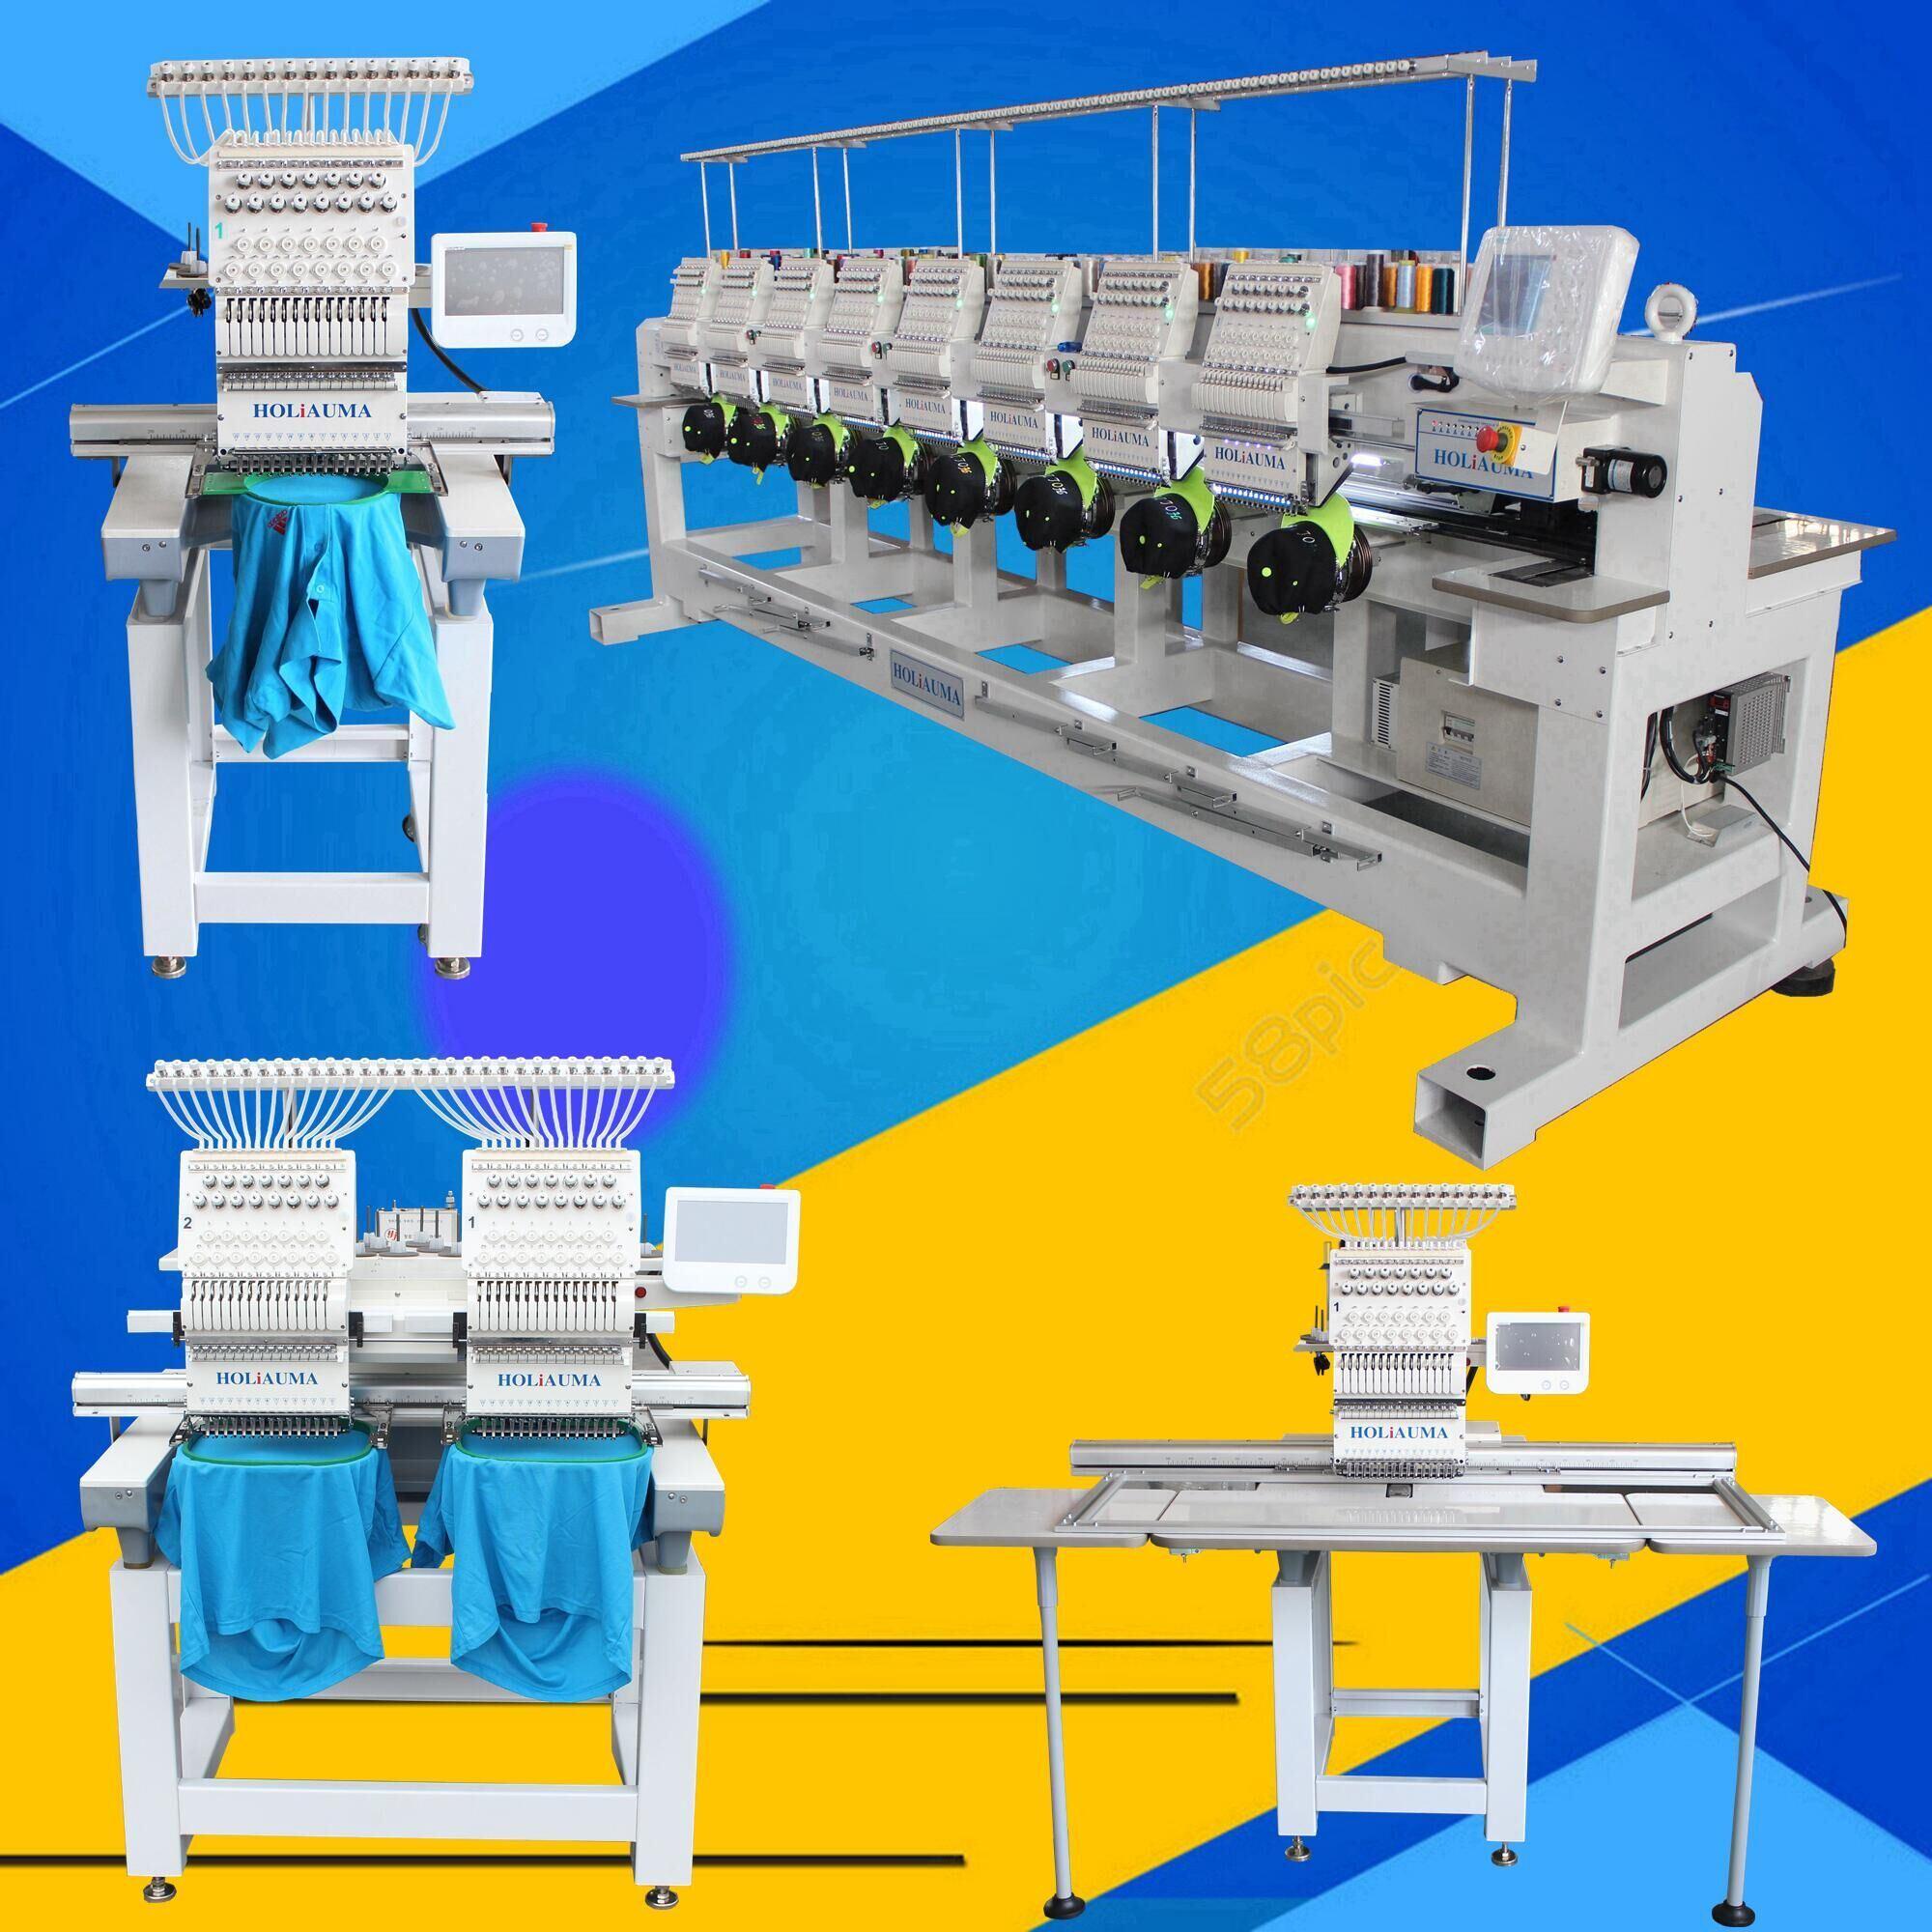 Holiauma Factory New 15 Colors Single Head Computerized Embroidery Machine for Cap/T-Shirt/Flat Garment Multi Embroidery